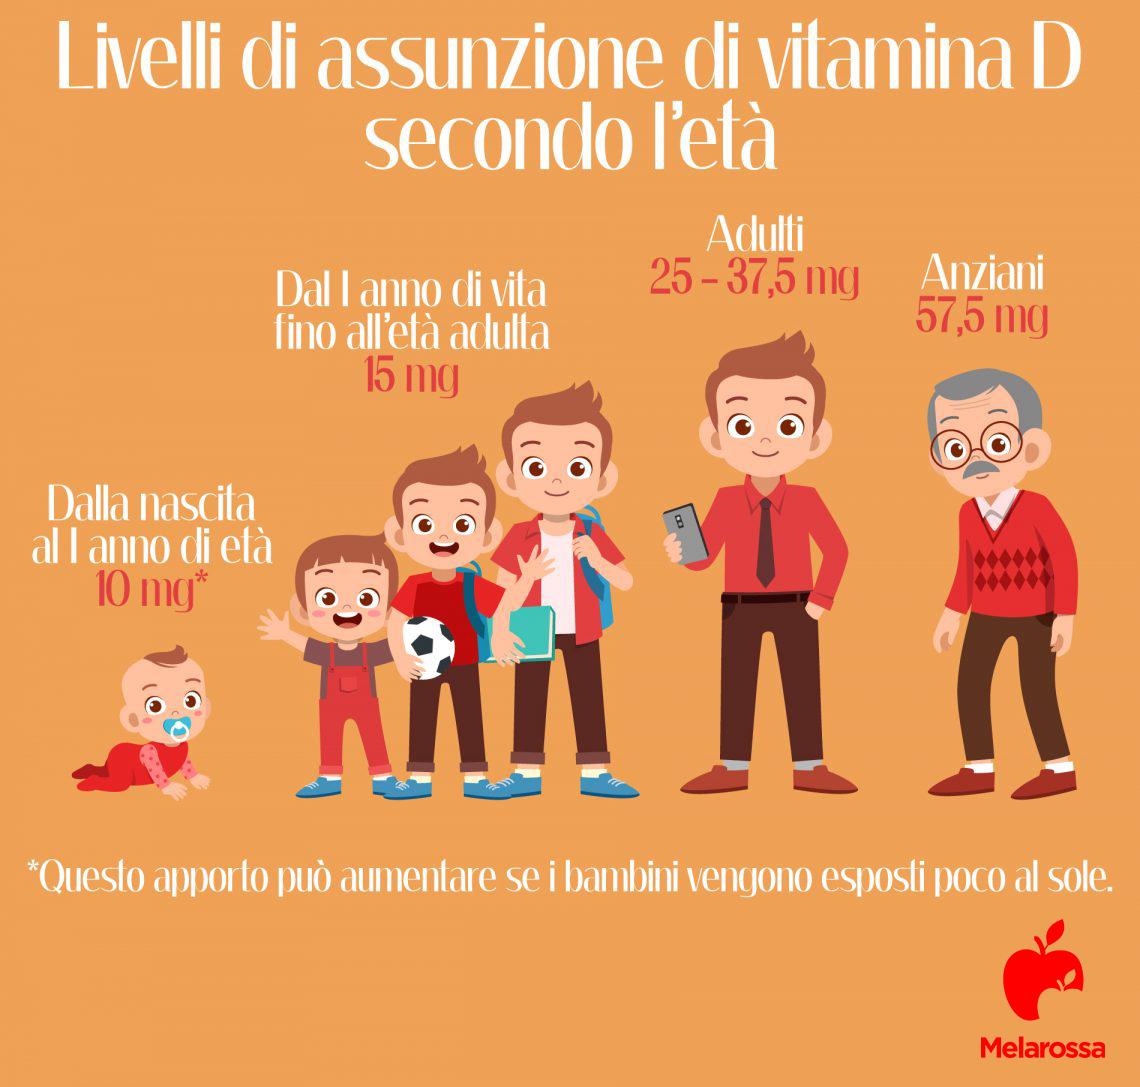 Quanta vitamina D assumere in funzione dell'età